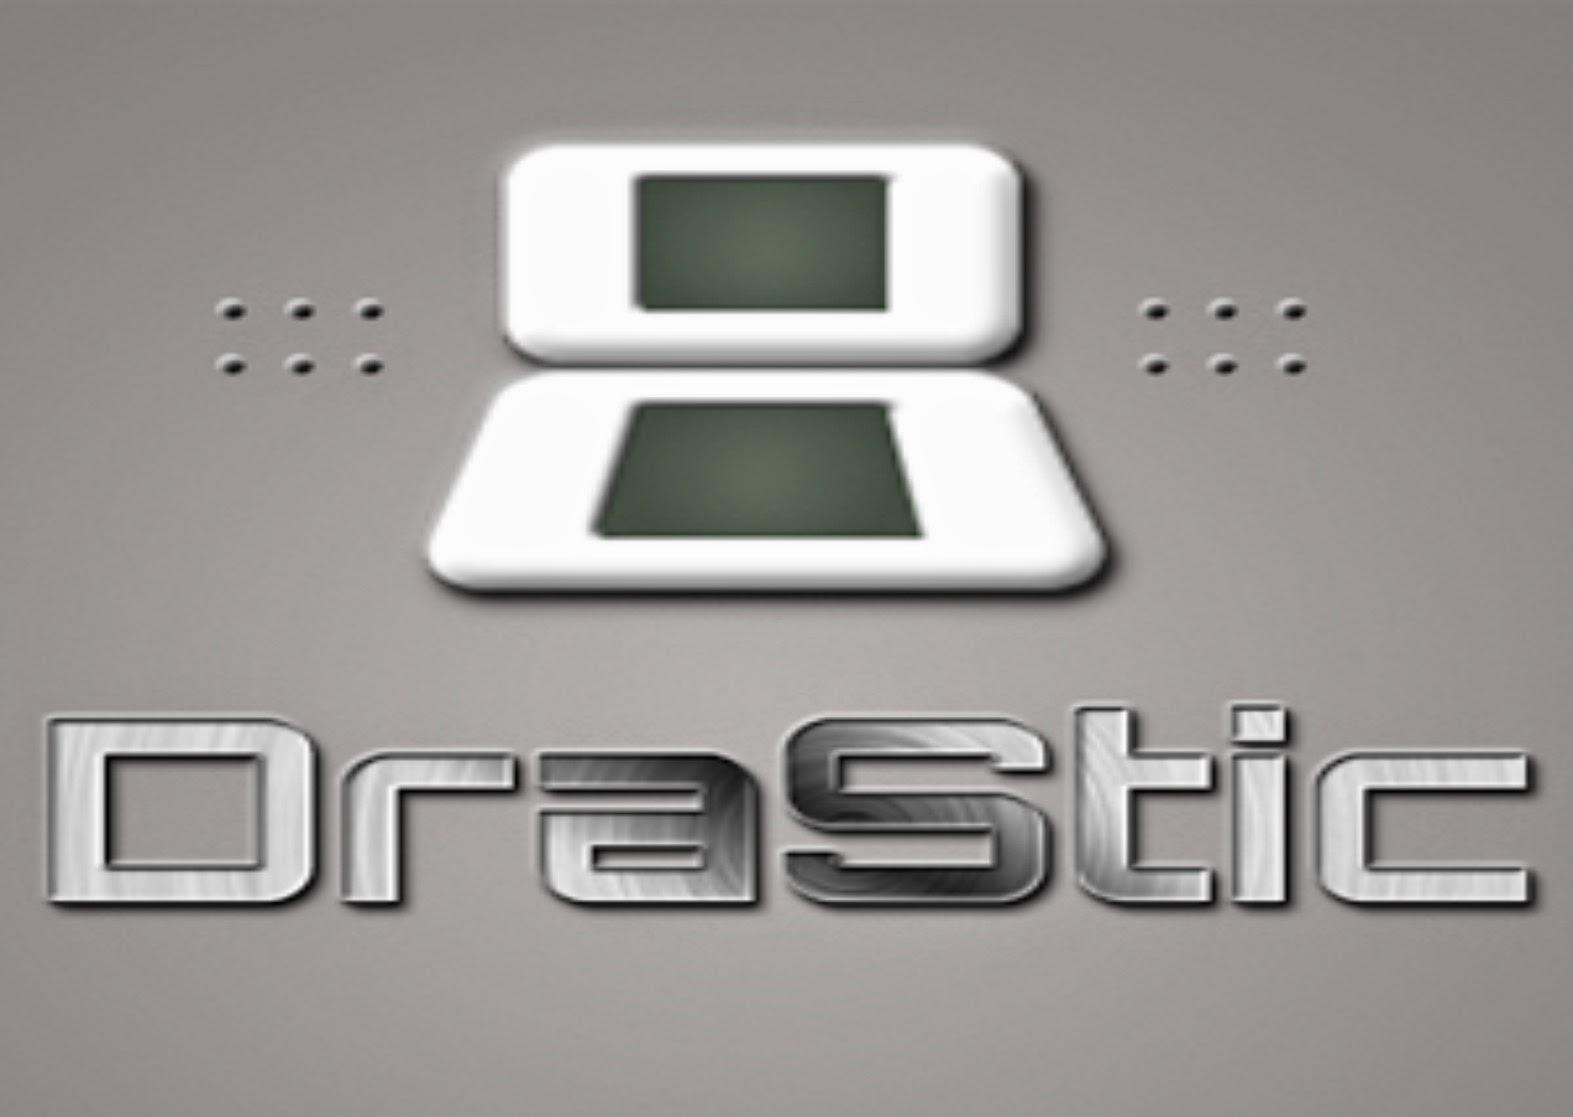 Drastlc Ds Emulator Cracked